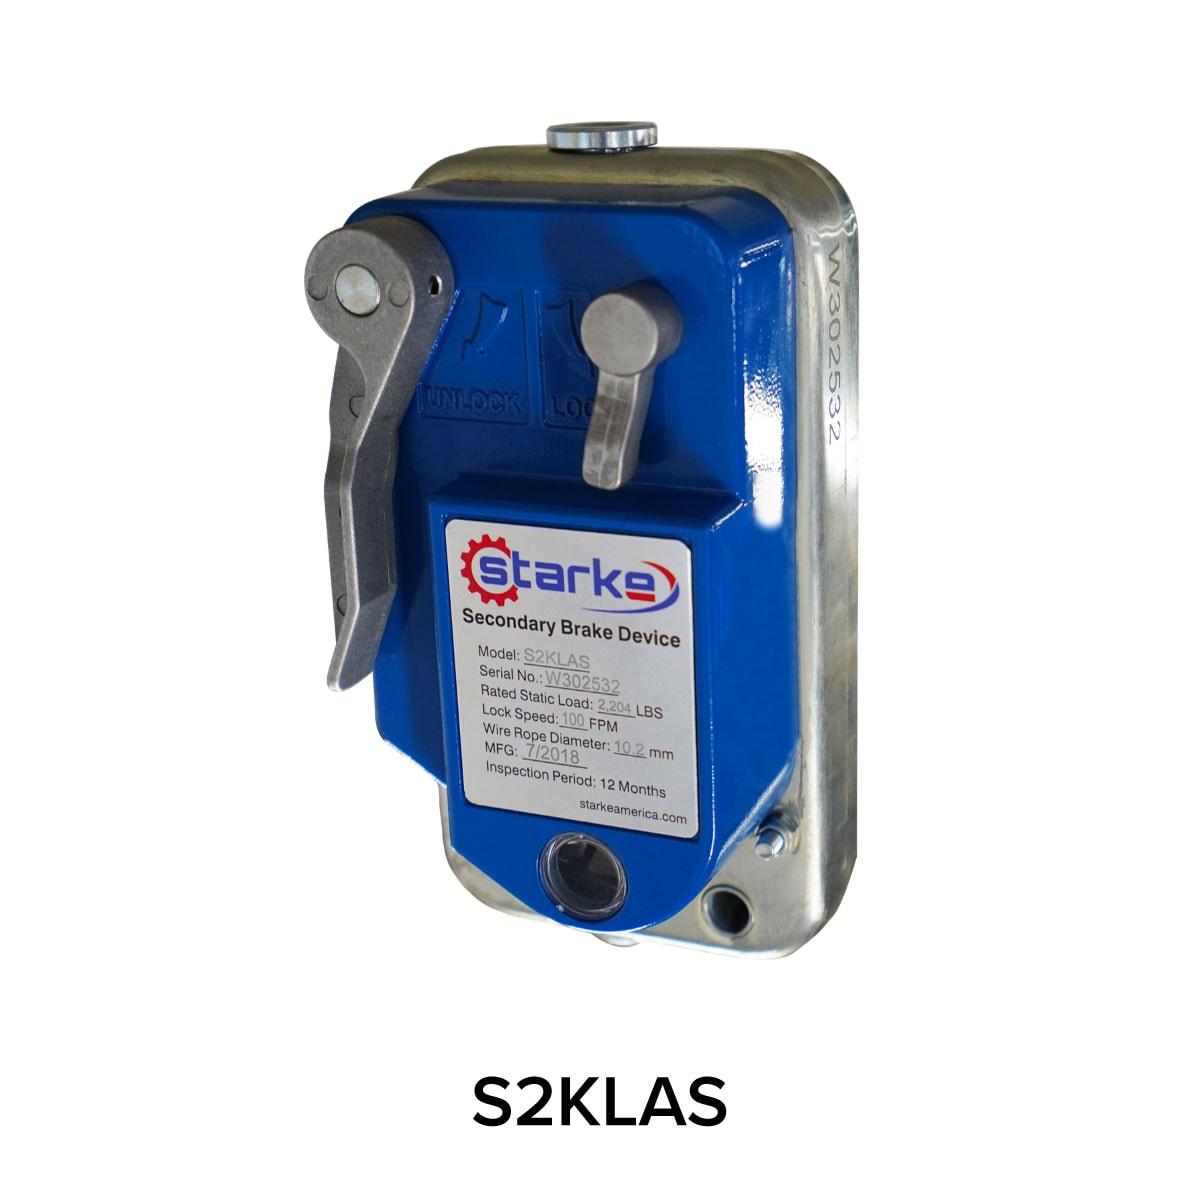 Starke Secondary Brake Device S2KLAS